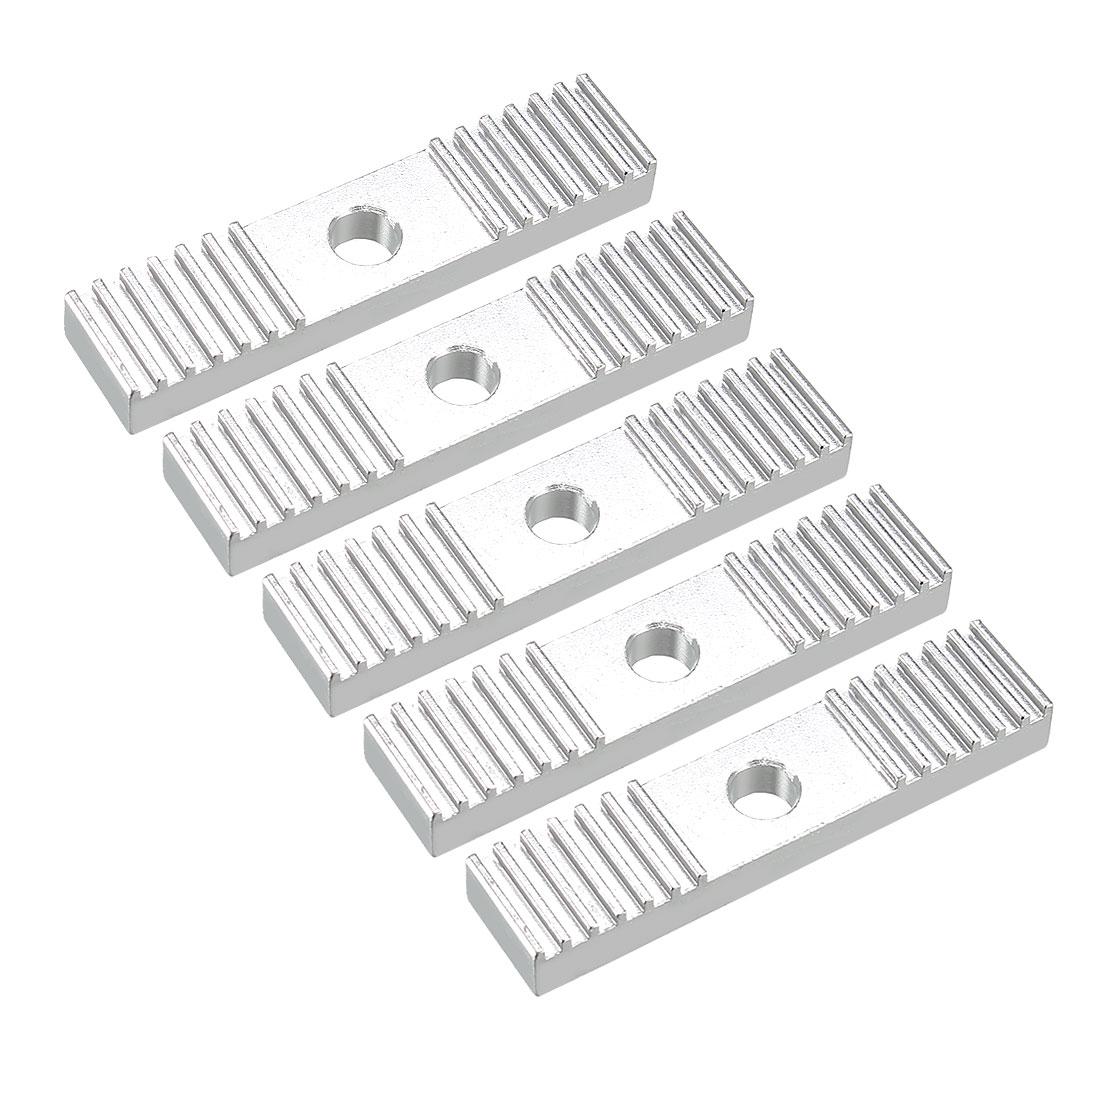 9 x 40 mm GT2 Timing Belt Aluminum Gear Clamp Mounting Block for 3D Printer 5pcs